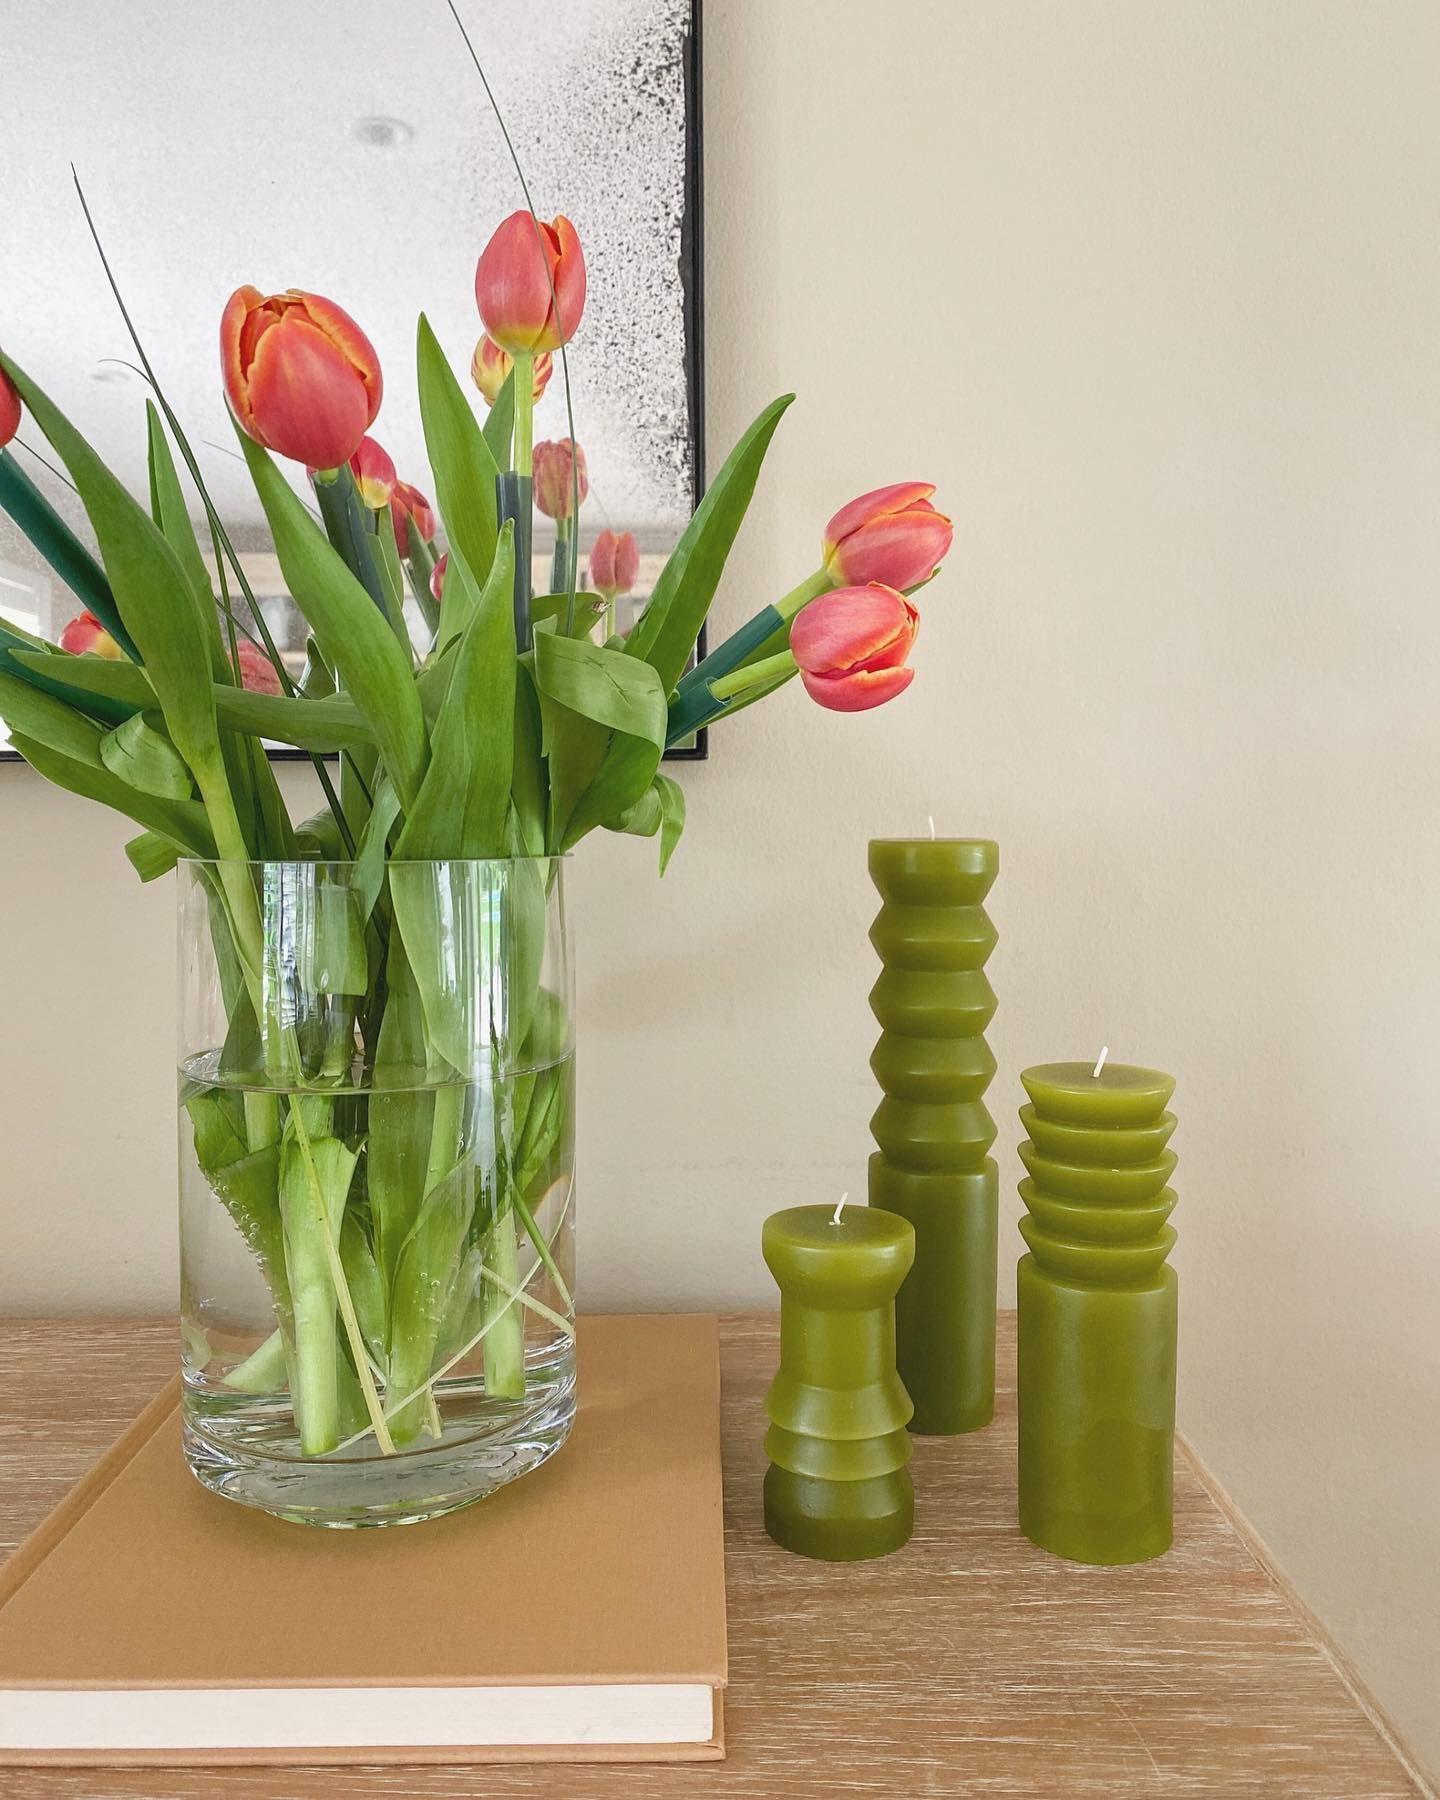 Sunday freshness  . . . . #allthingsbotanical #floralife #floweraddict #tulips #flowergram #flowersmakemehappy #summervibes #aesthetics #homeaesthetics #cornerofmyhome #blogwithme #flowerpowered #flowersoftheday #simplepleasures #flowerlife #postitfortheaesthetics #cb2 #areaware #candles #90svintage #discoverunder20k #picsoftheday #curatedhome #curateyourownfeed